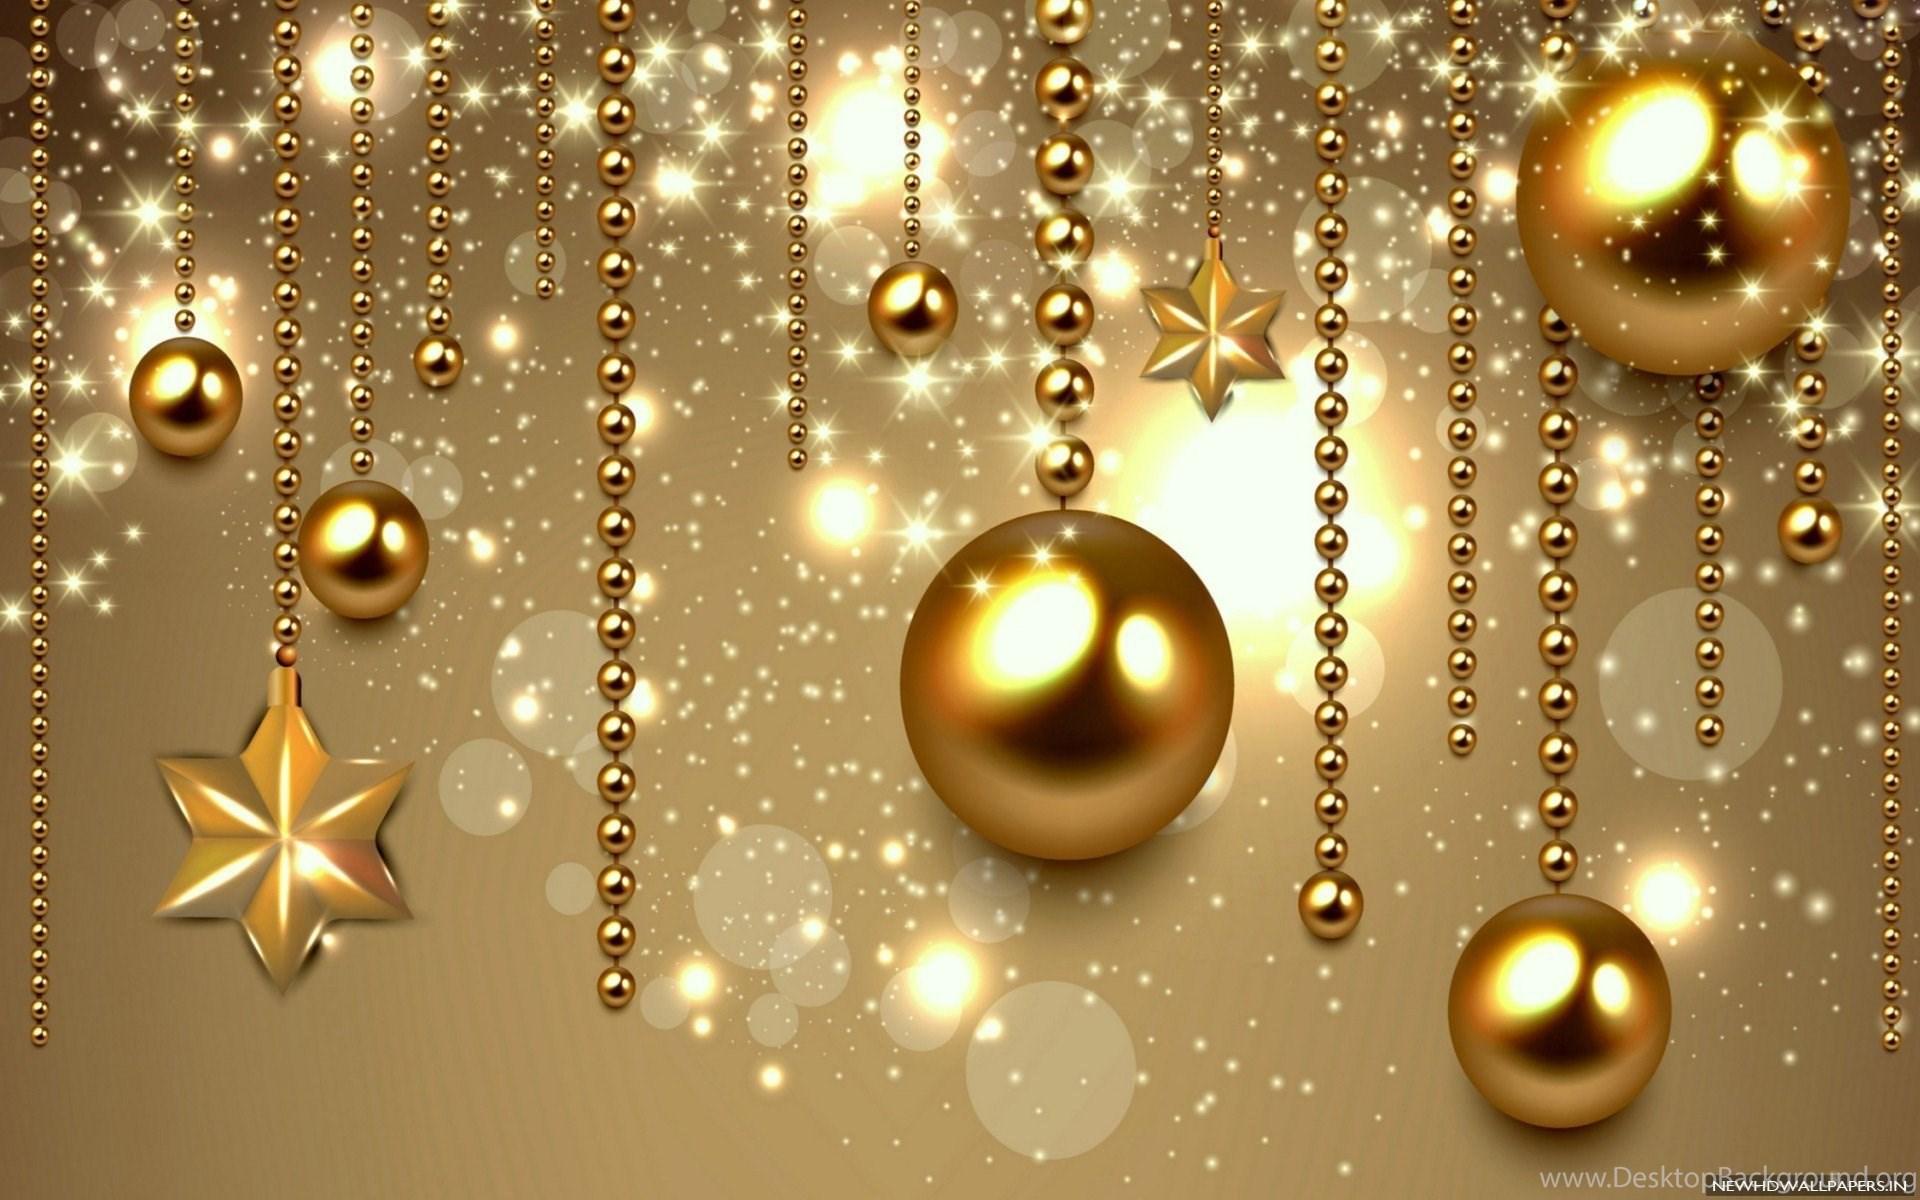 Golden Balls Bokeh Christmas Hd Wallpapers Desktop Background